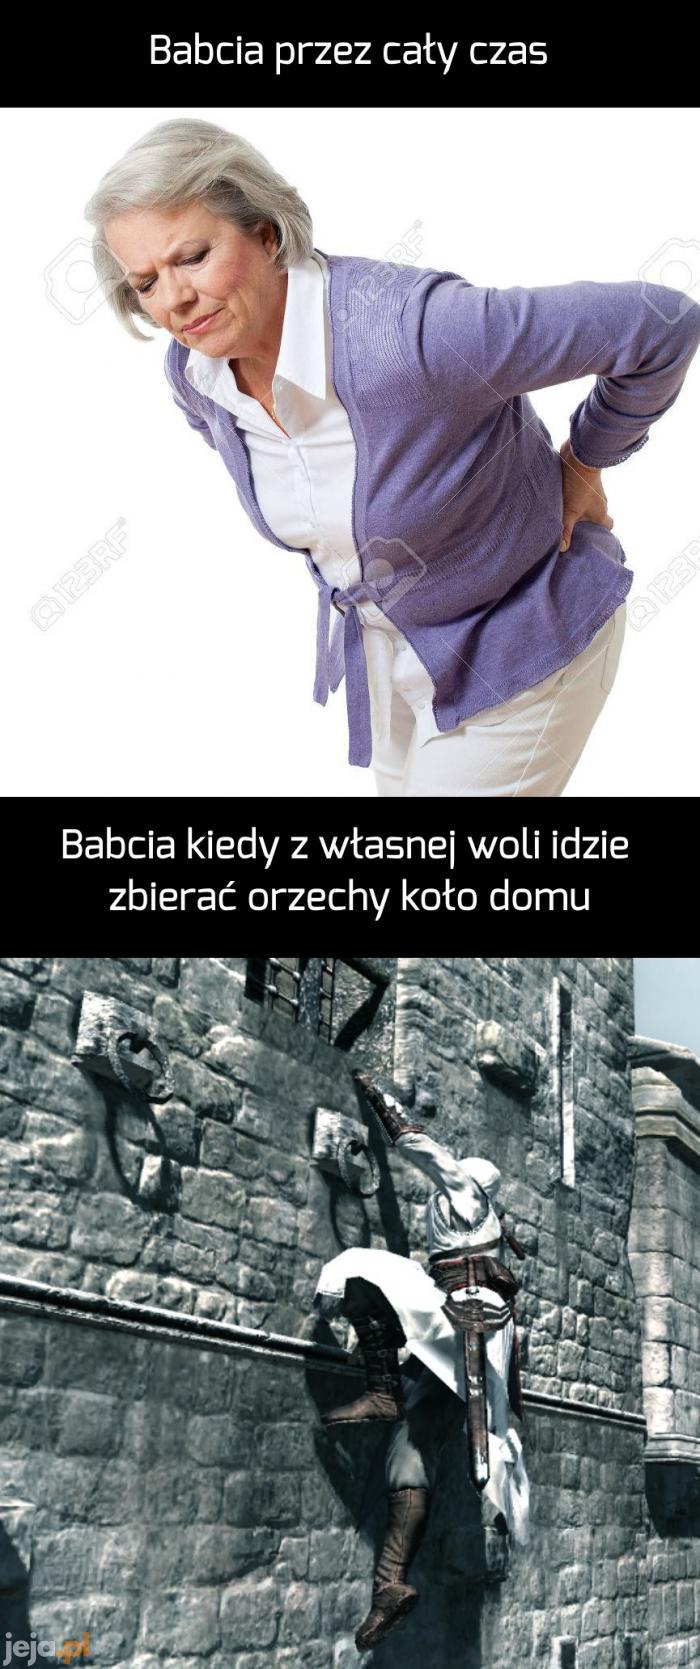 Babcia's Creed